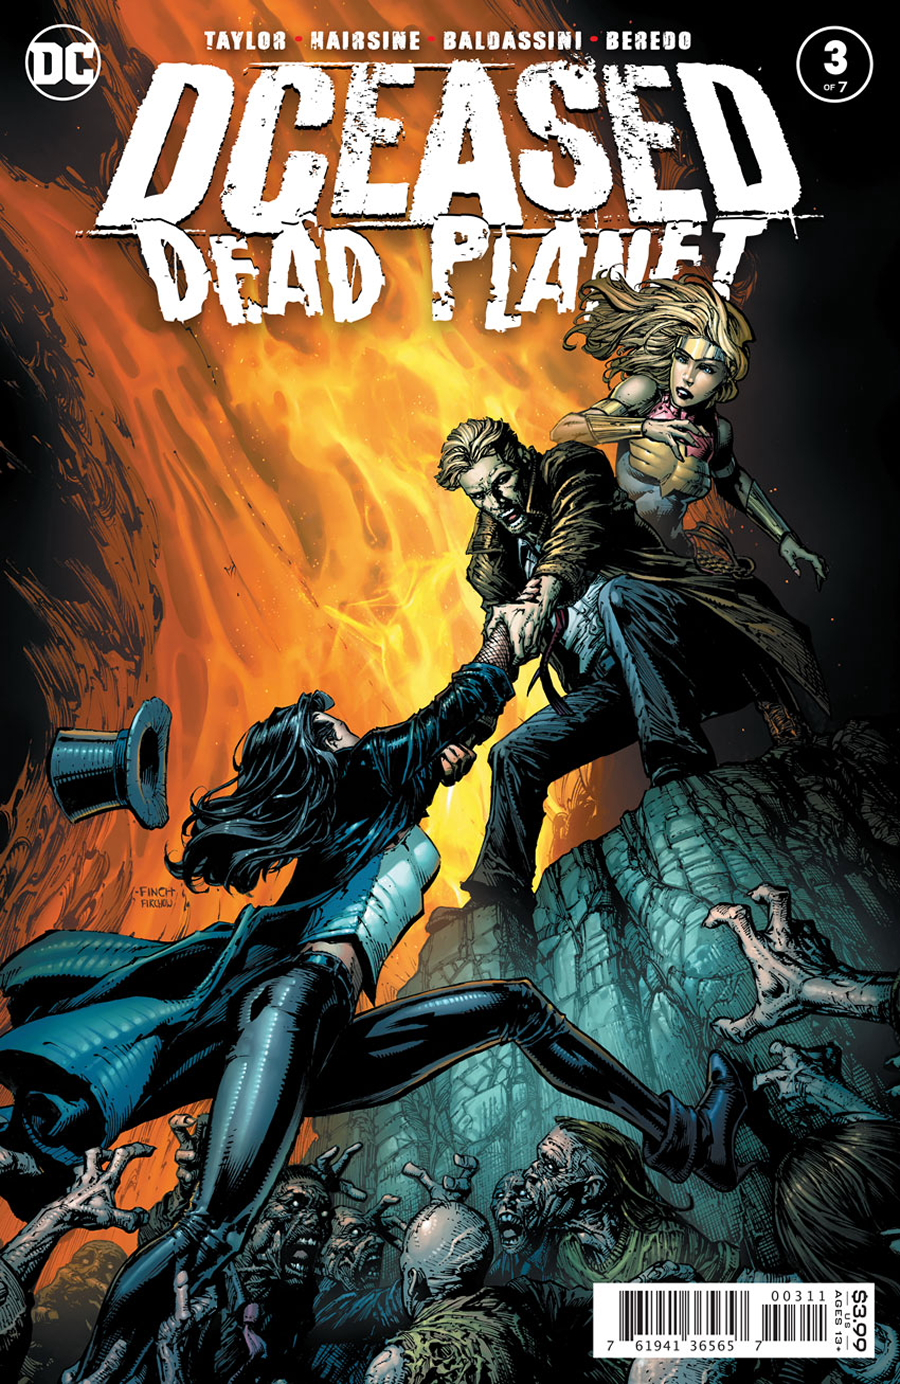 DCeased Dead Planet #3 NM//MT COVER C PUTRI MOVIE HOMAGE VARIANT 9//1 2020